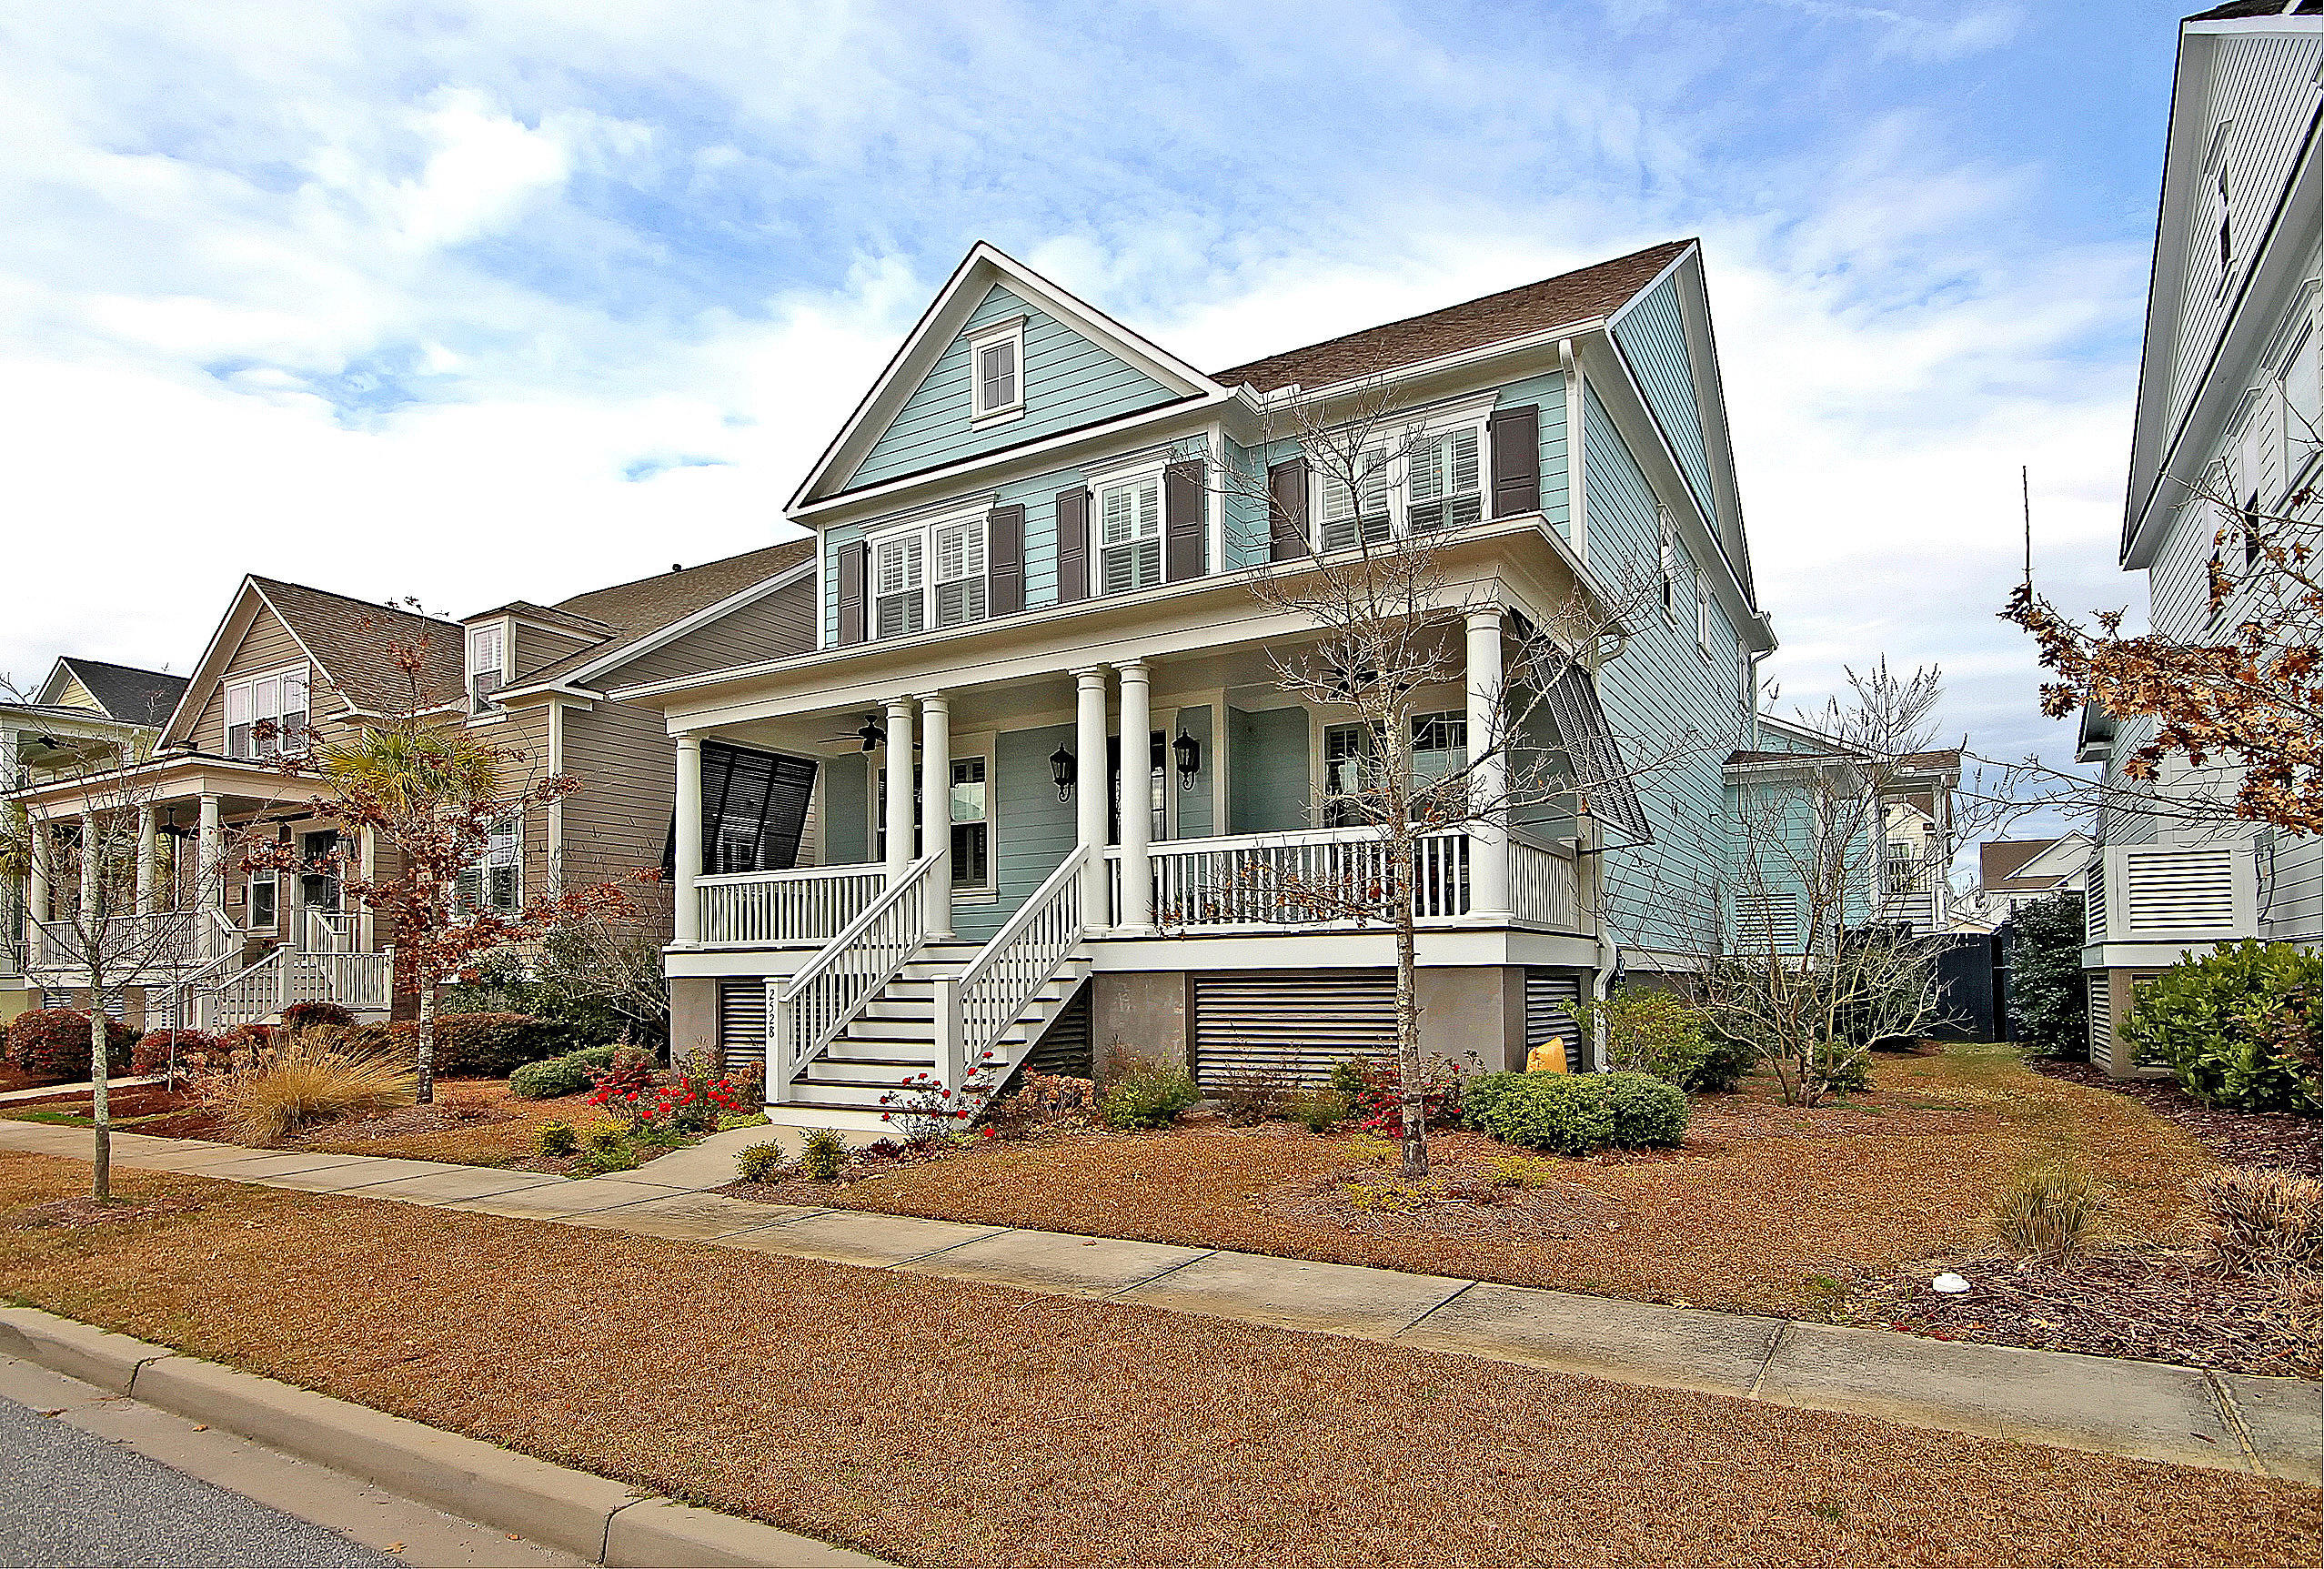 Daniel Island Homes For Sale - 2528 Gatewood, Daniel Island, SC - 8